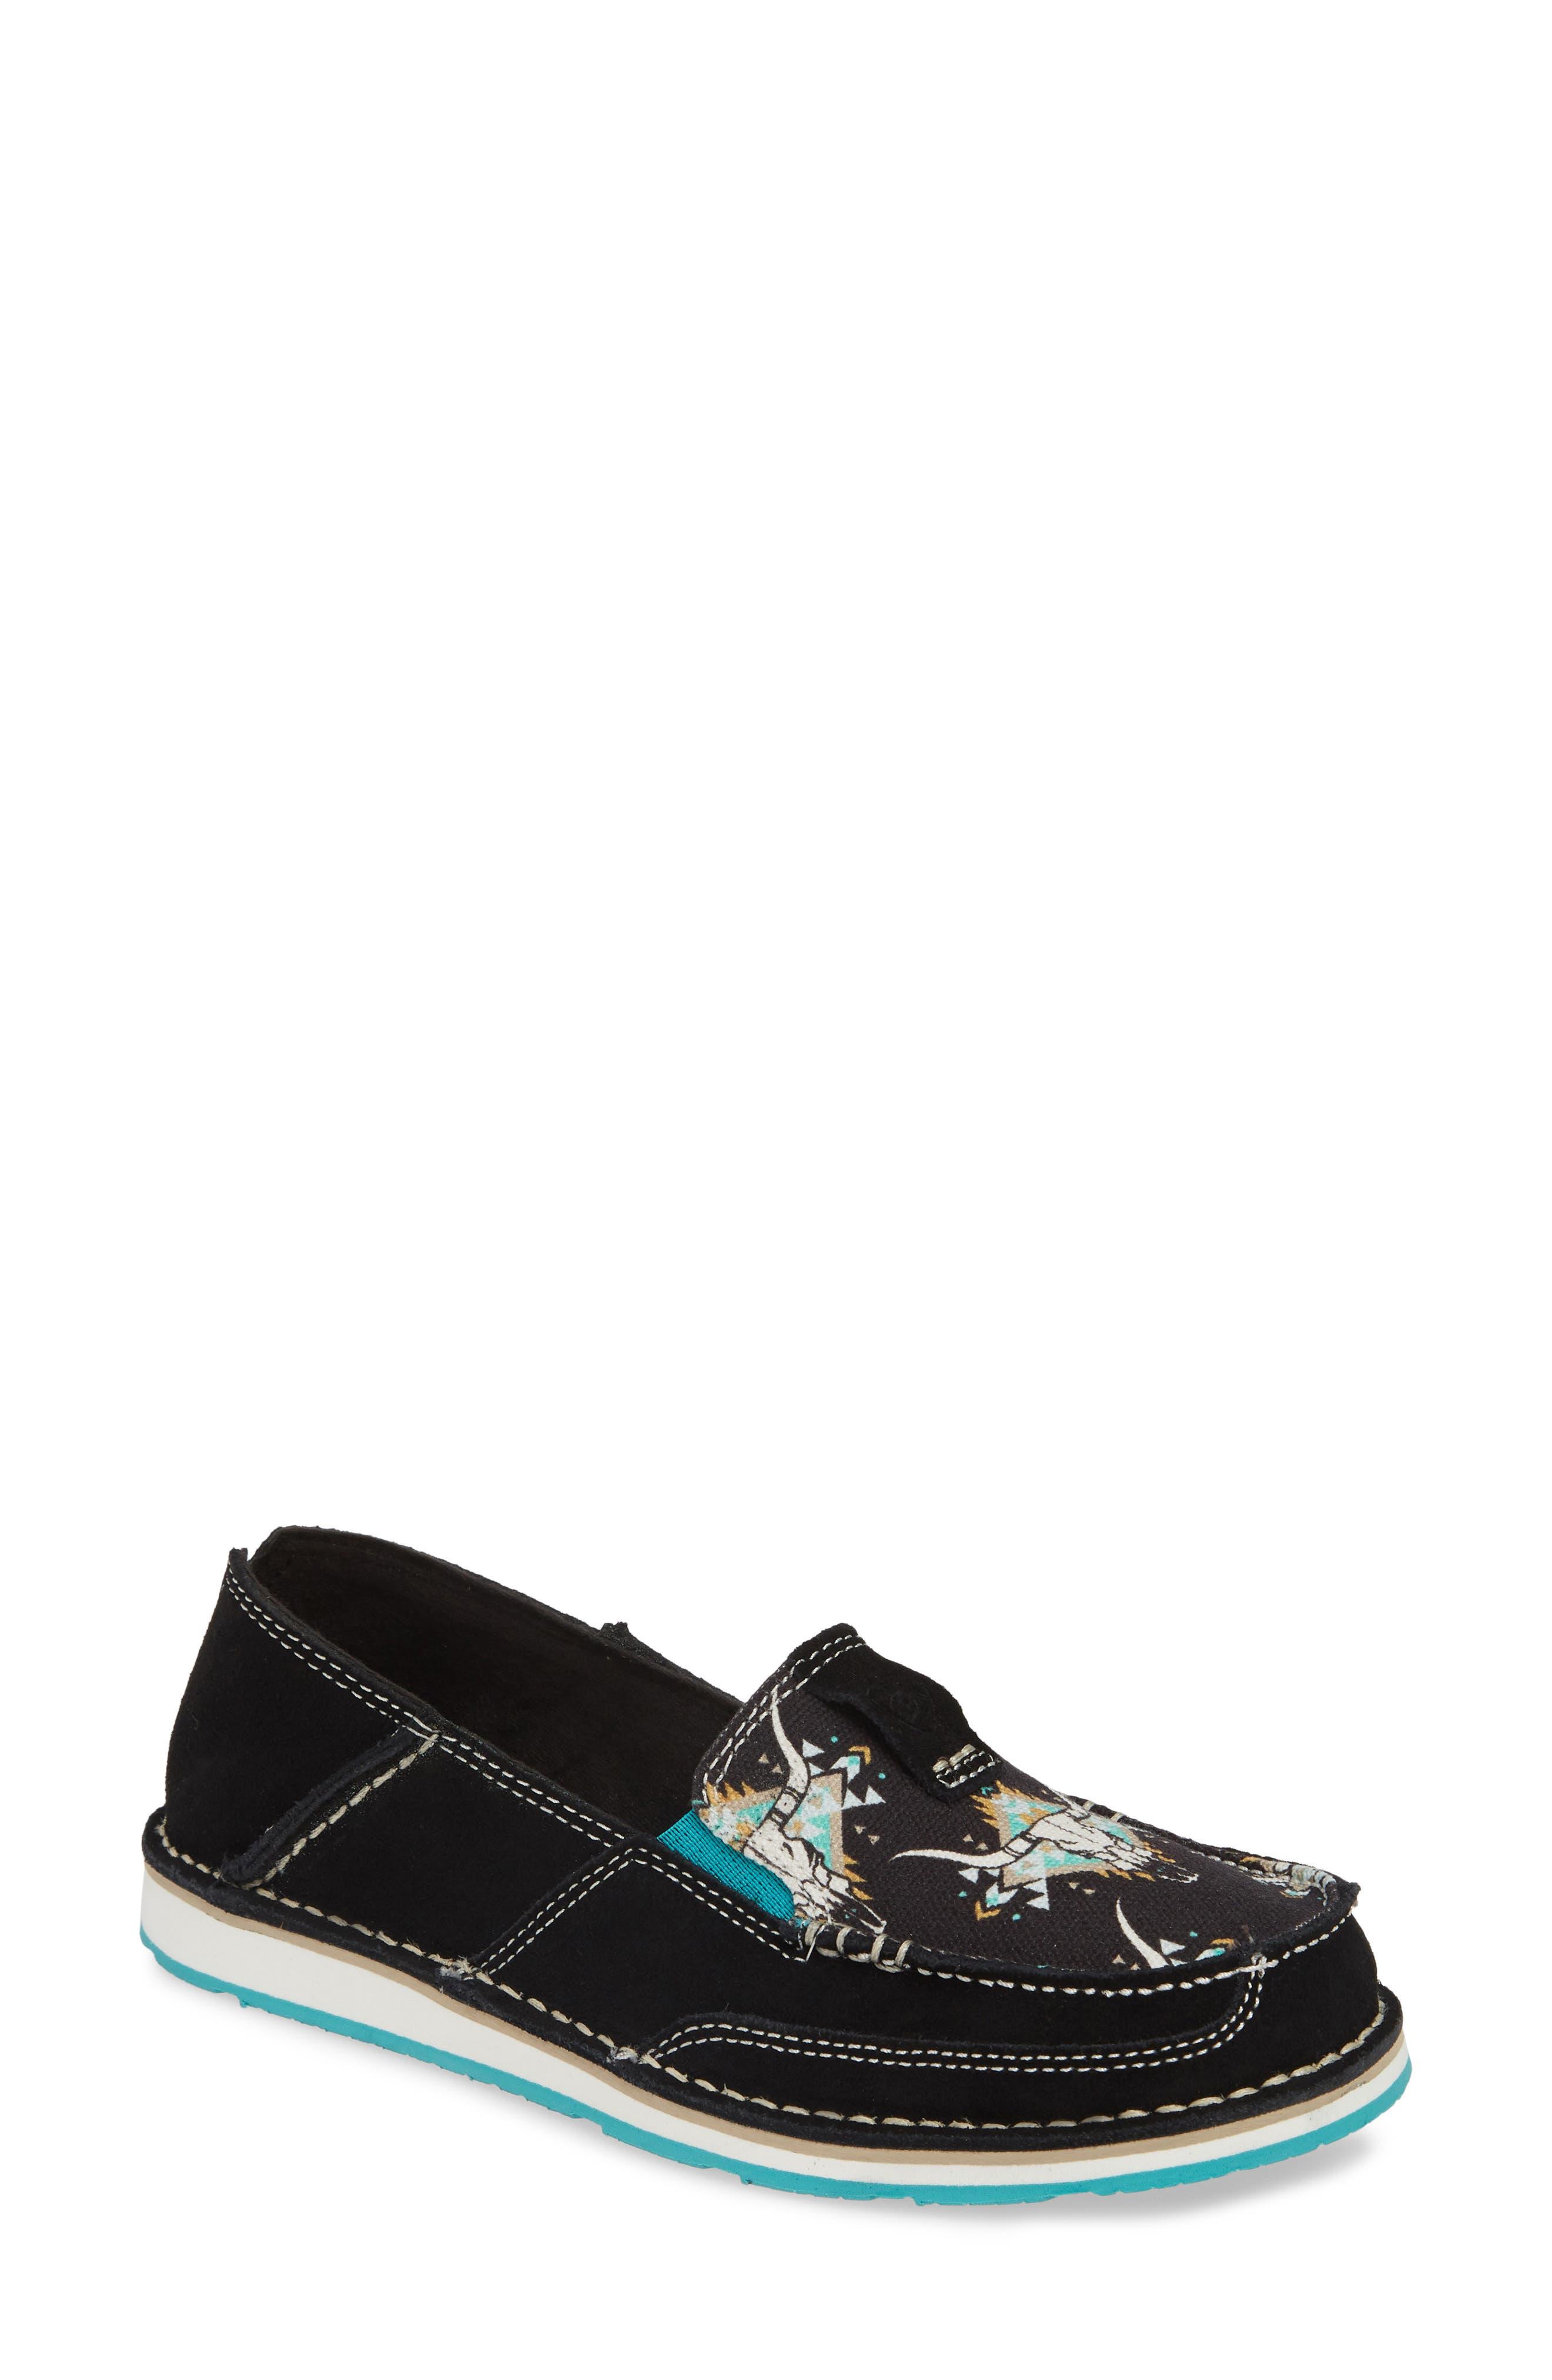 ARIAT Cruiser Slip-On Loafer, Main, color, BLACK STEER LEATHER